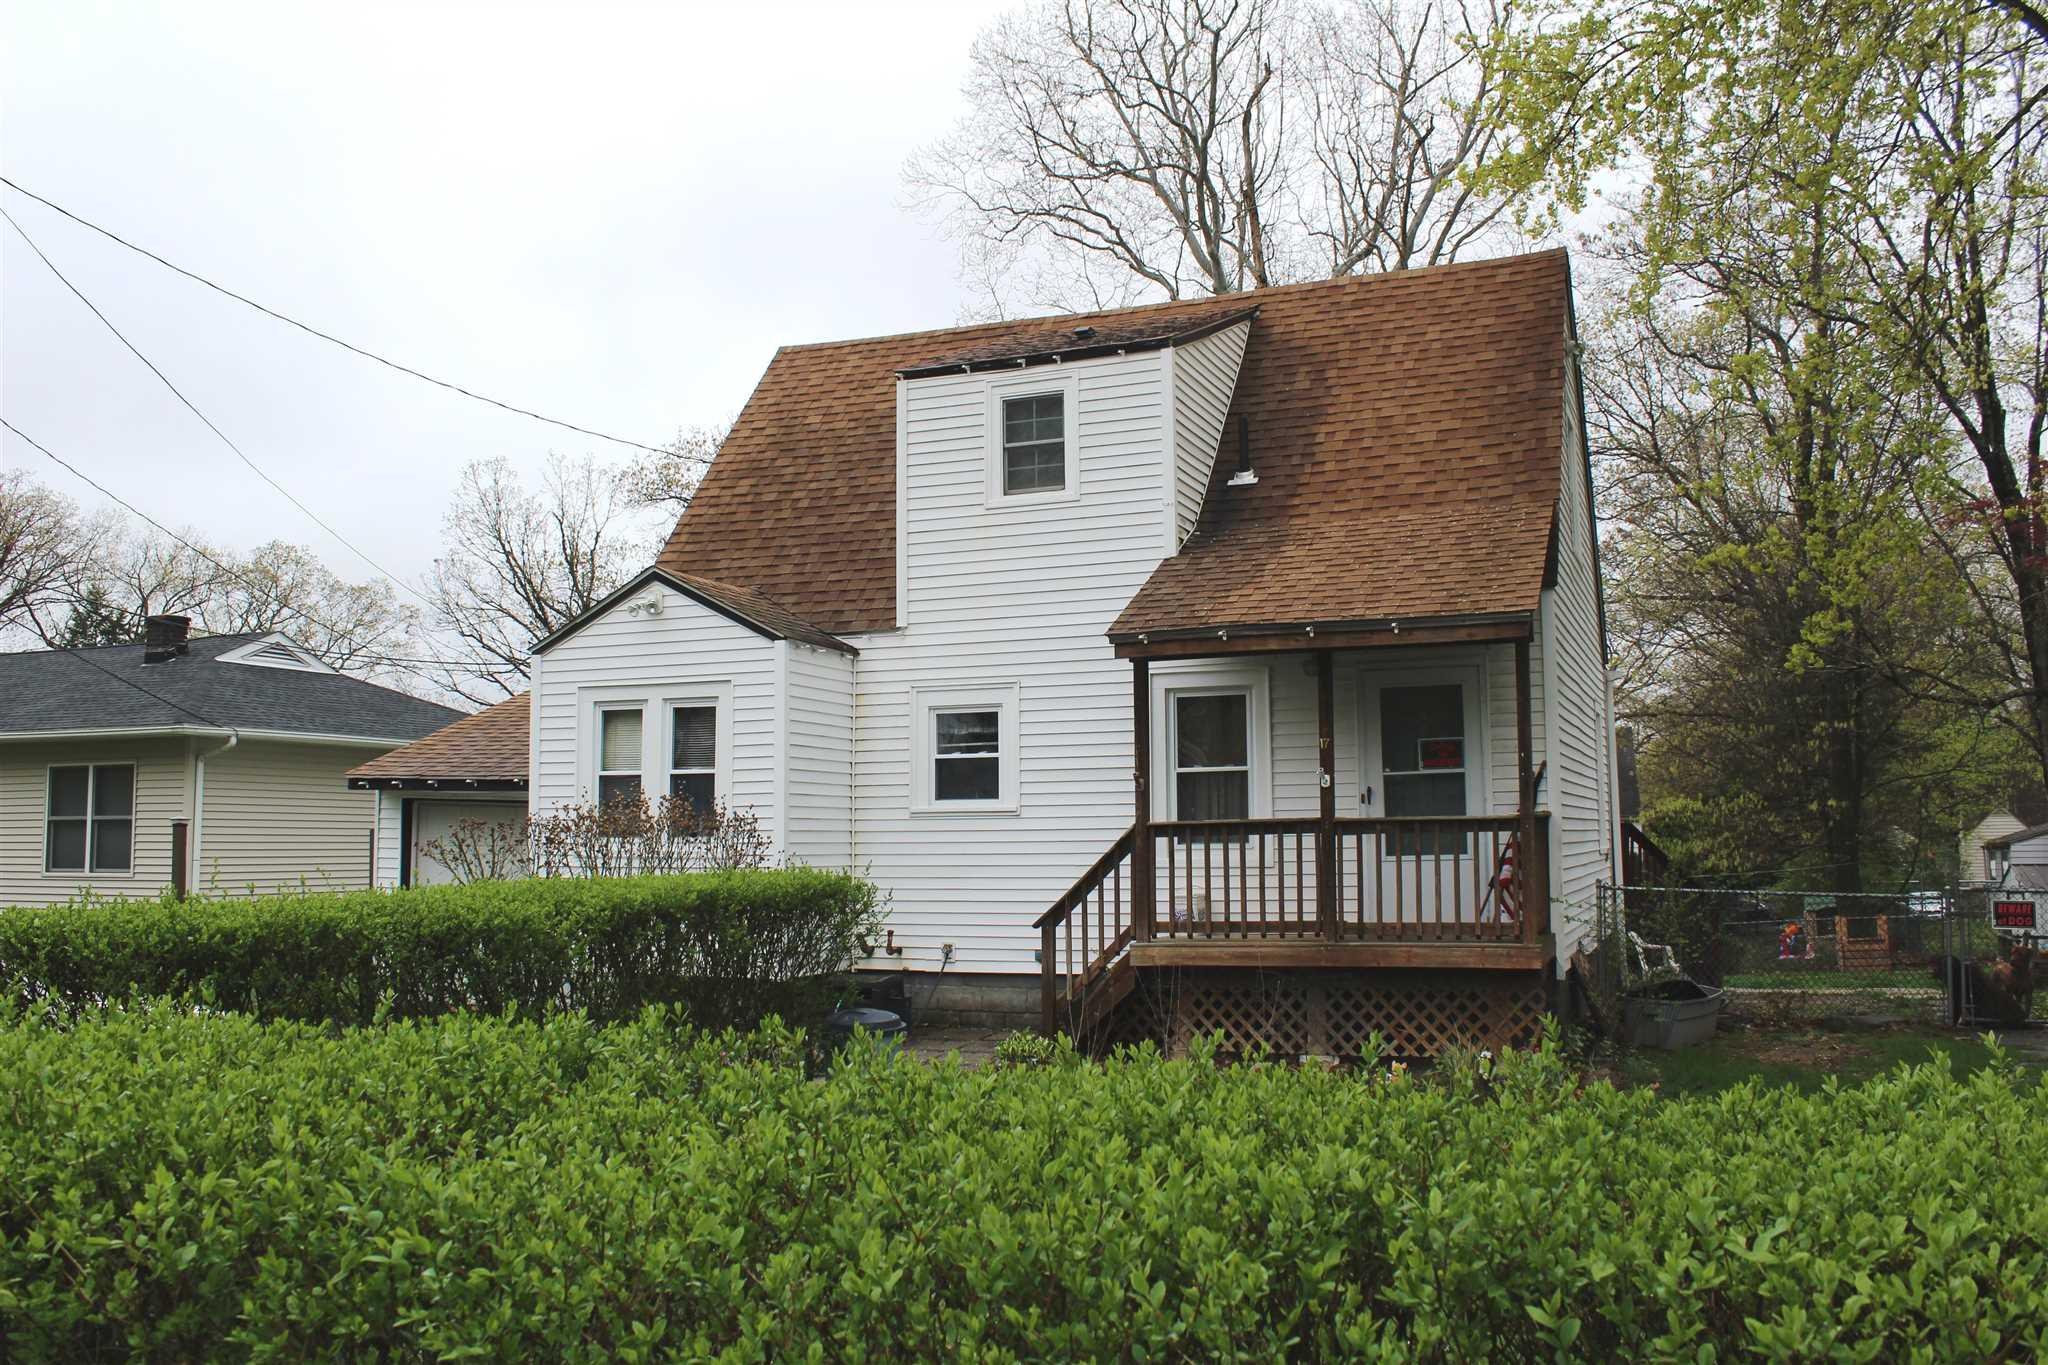 Single Family Home for Sale at 17 PILGRIM TERRACE 17 PILGRIM TERRACE Hyde Park, New York 12601 United States